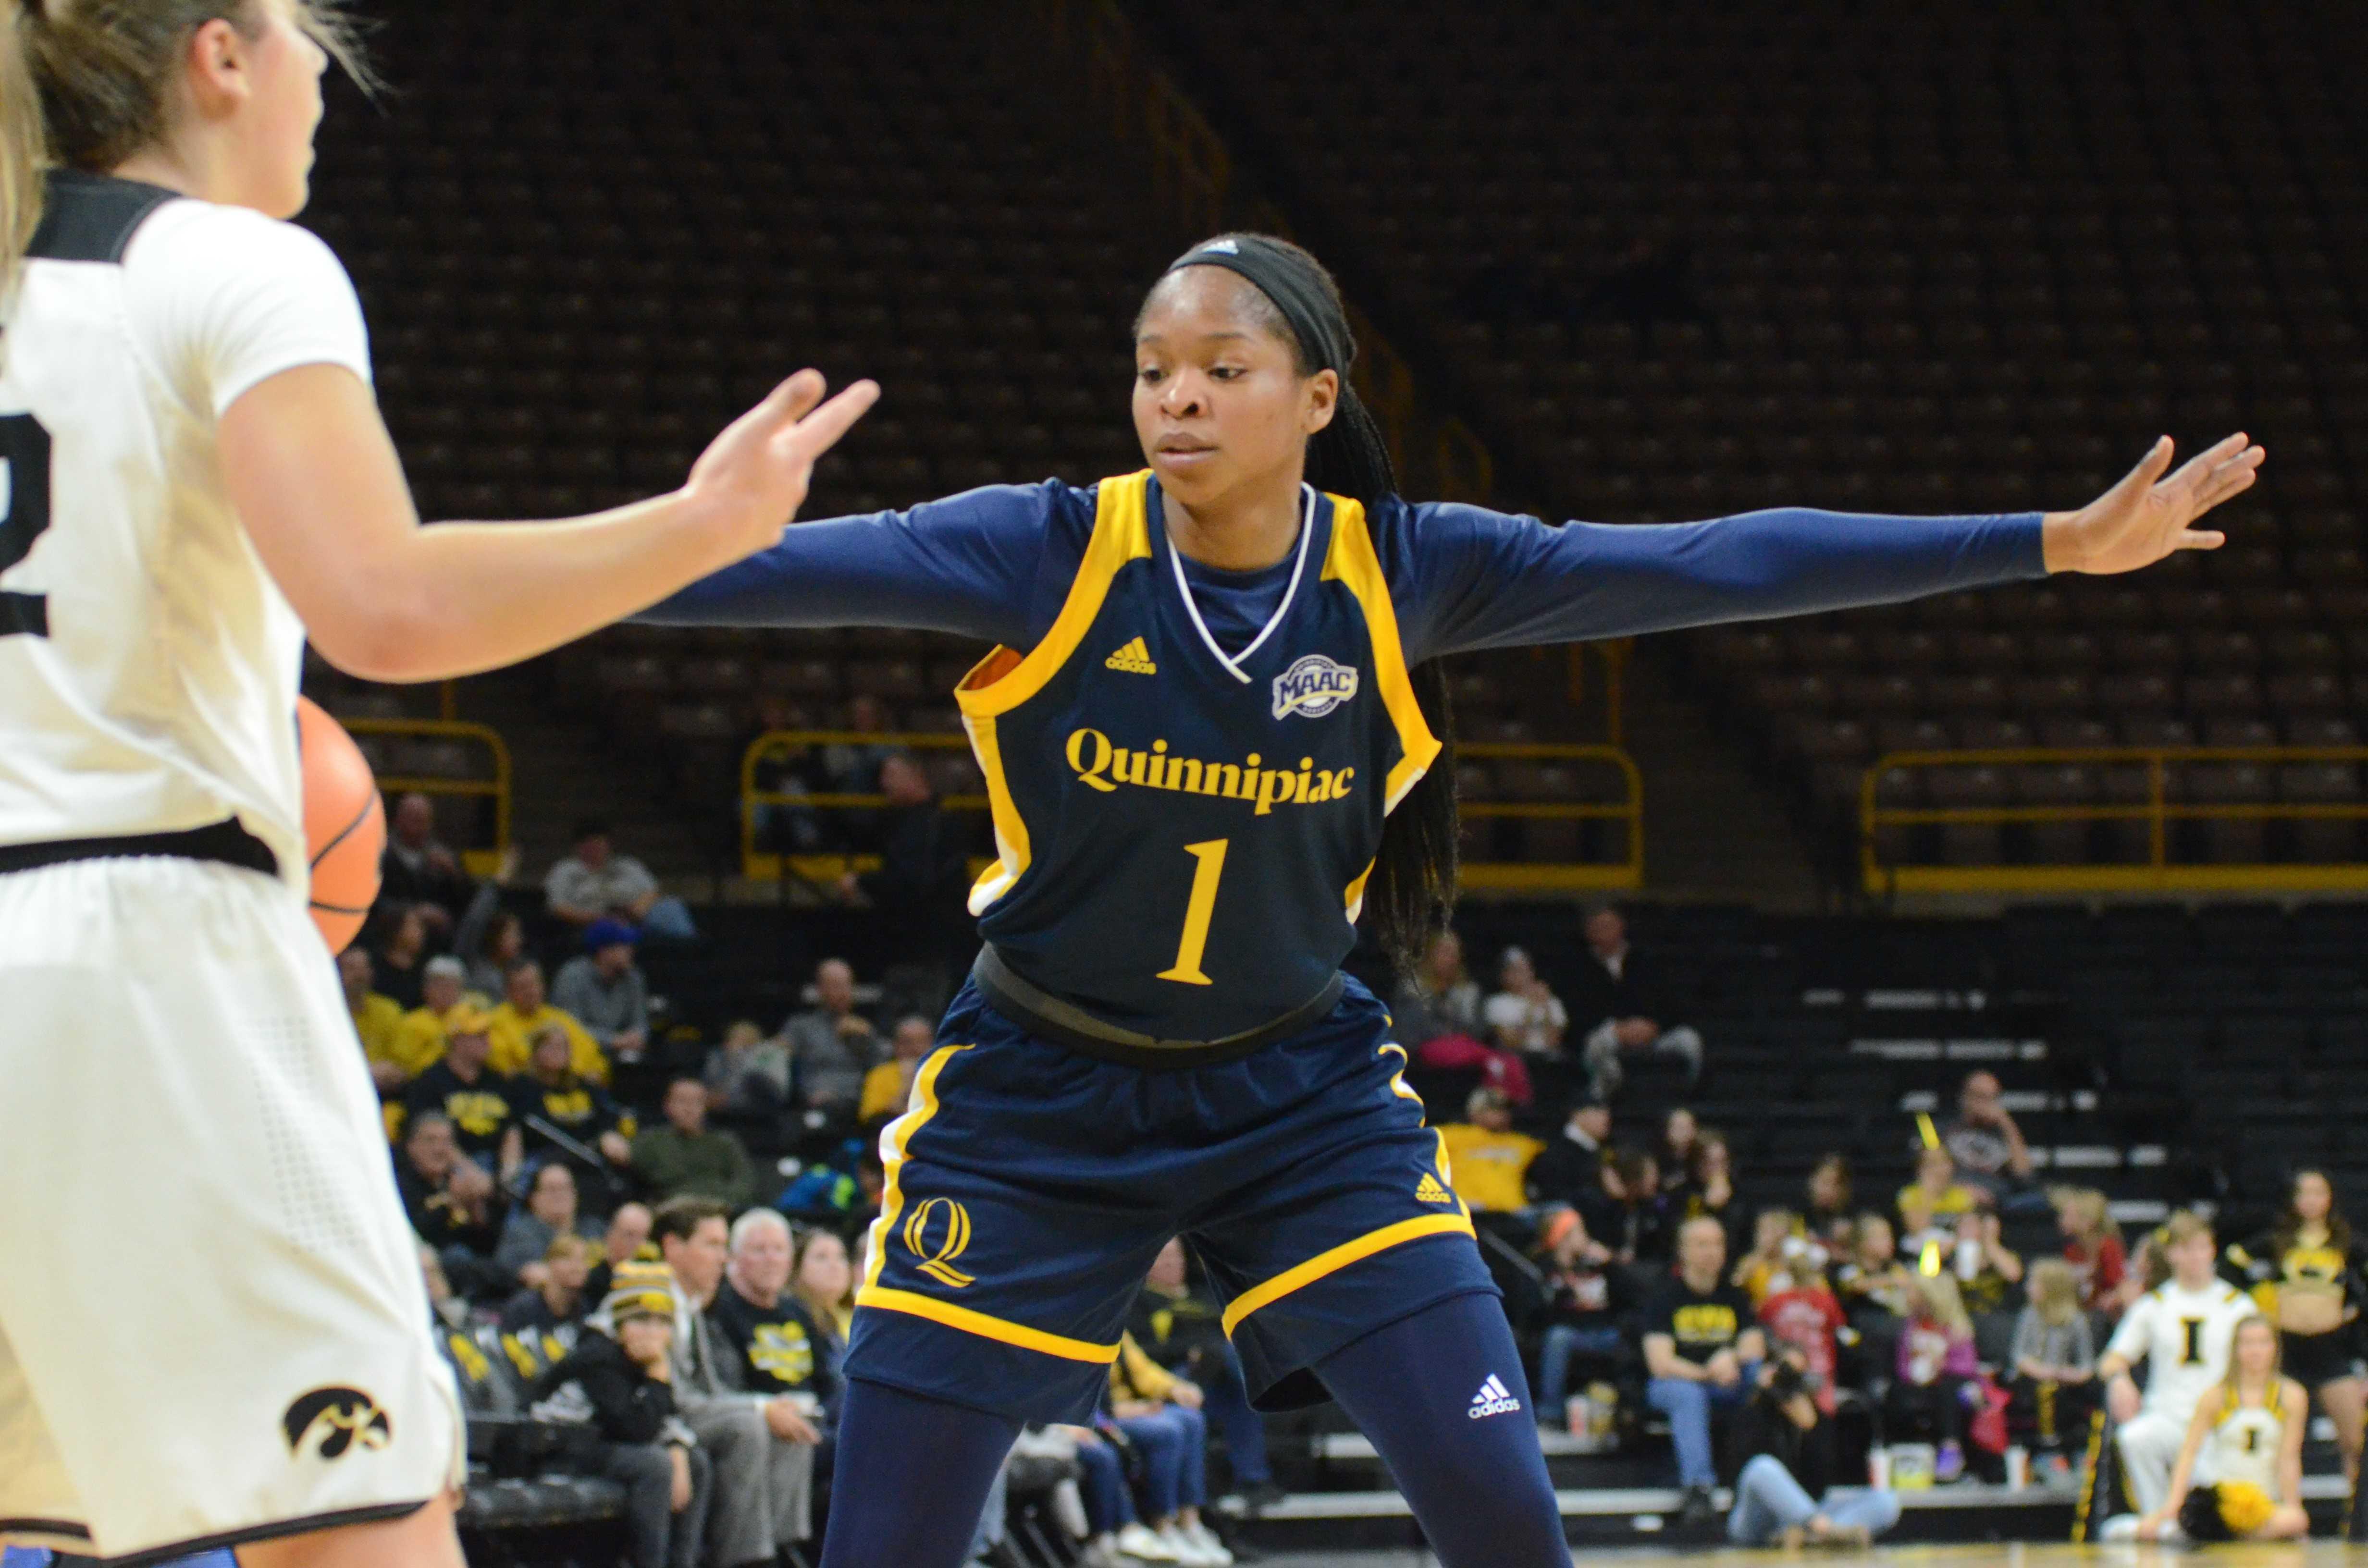 Quinnipiac women's basketball loses Udoji for the season